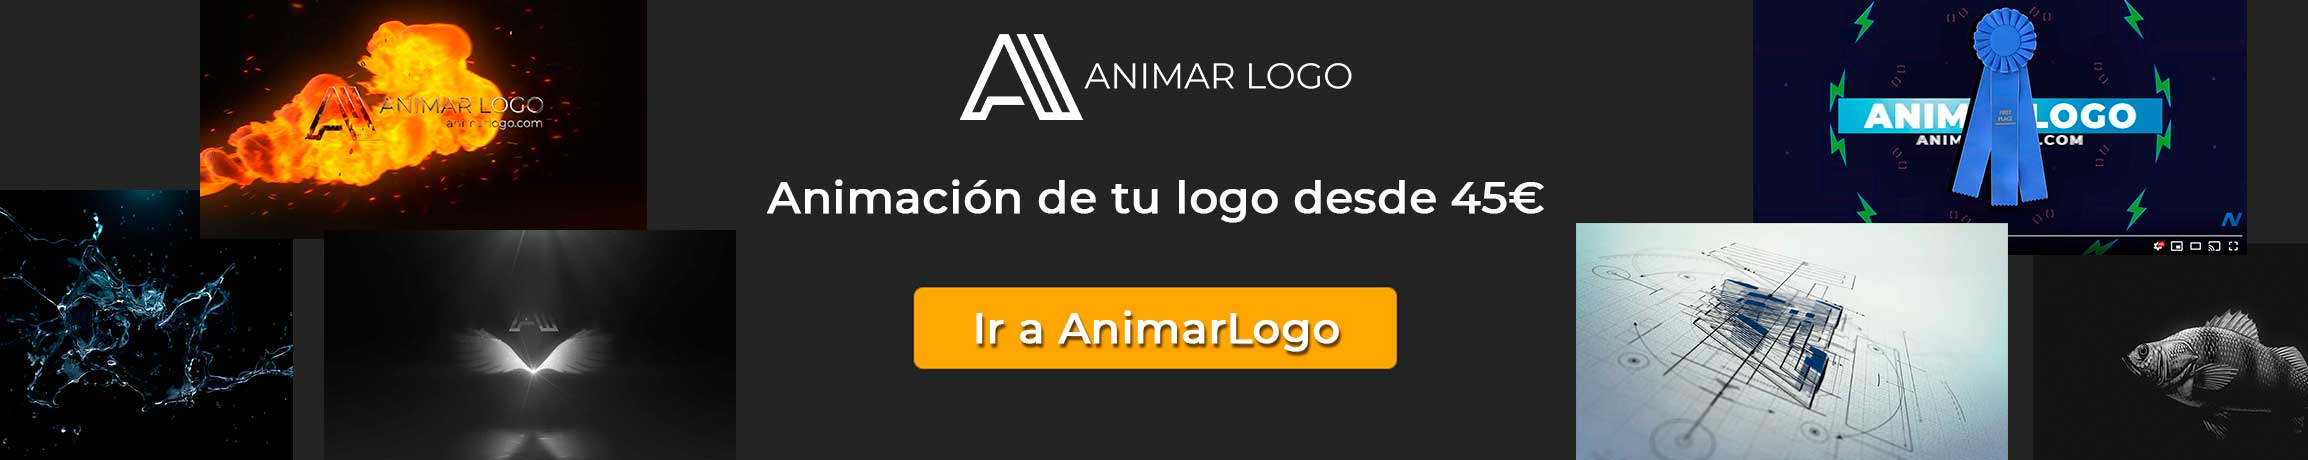 Banner-AnimarLogo-para-Descargas360-grande Laberinto de Horta 05